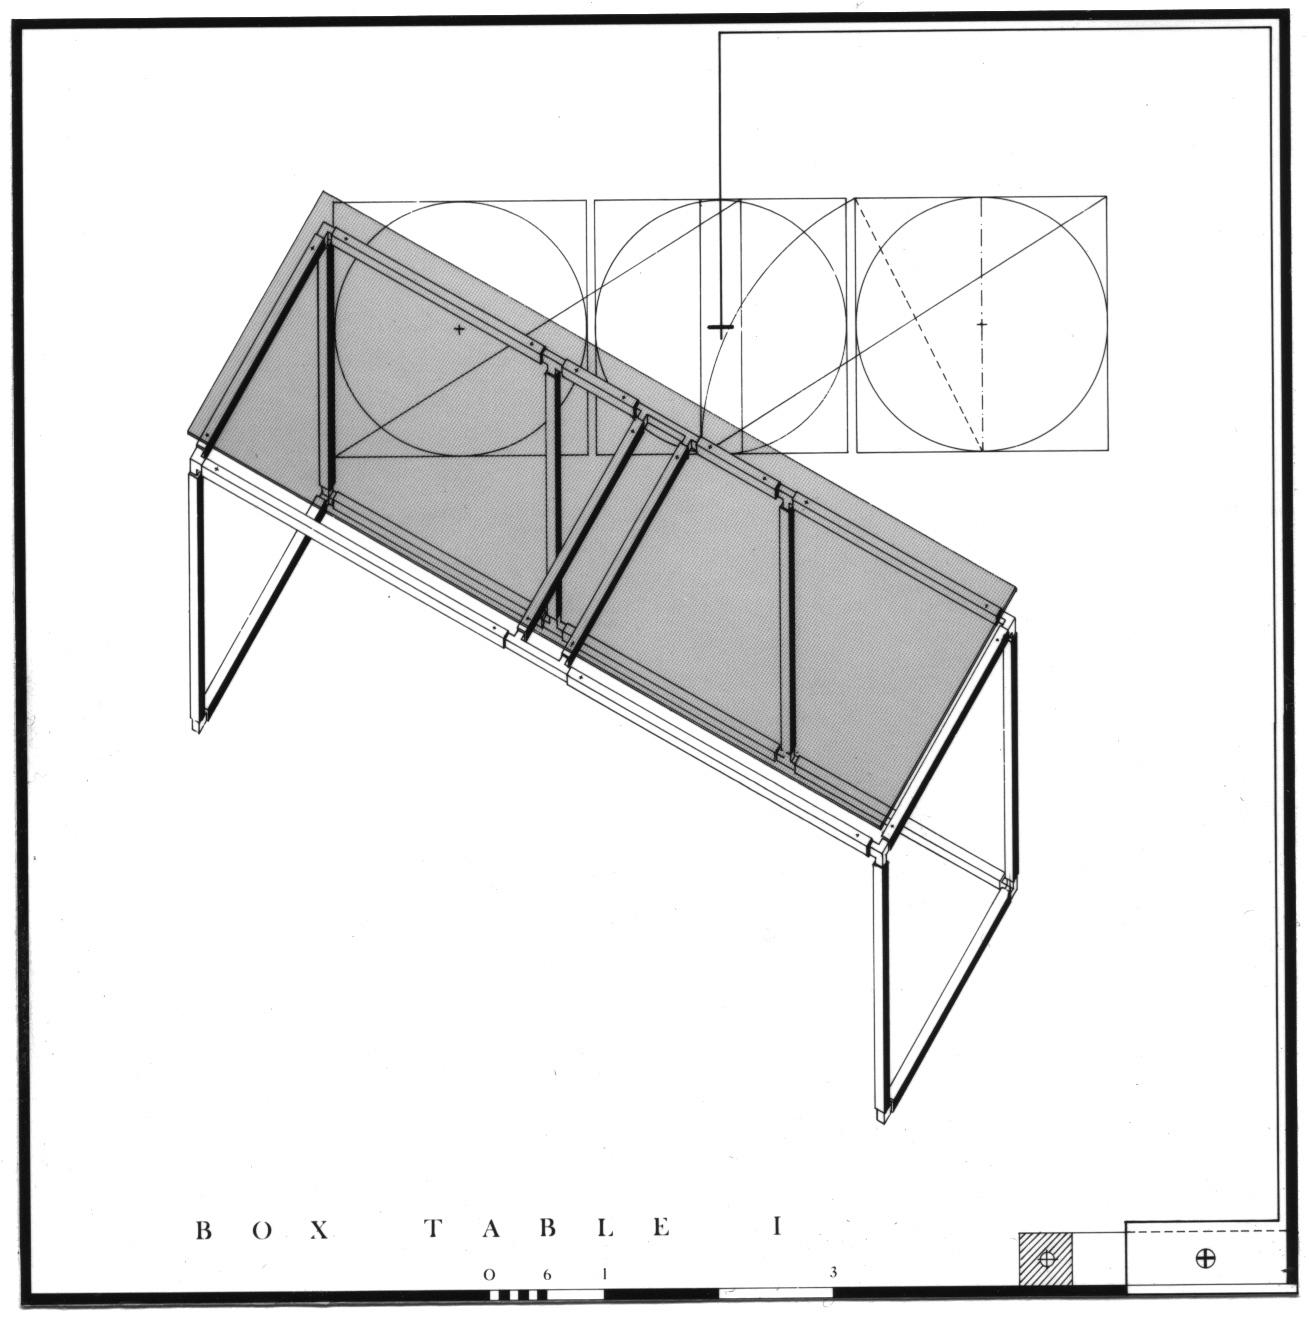 Box Table Drawing.jpg